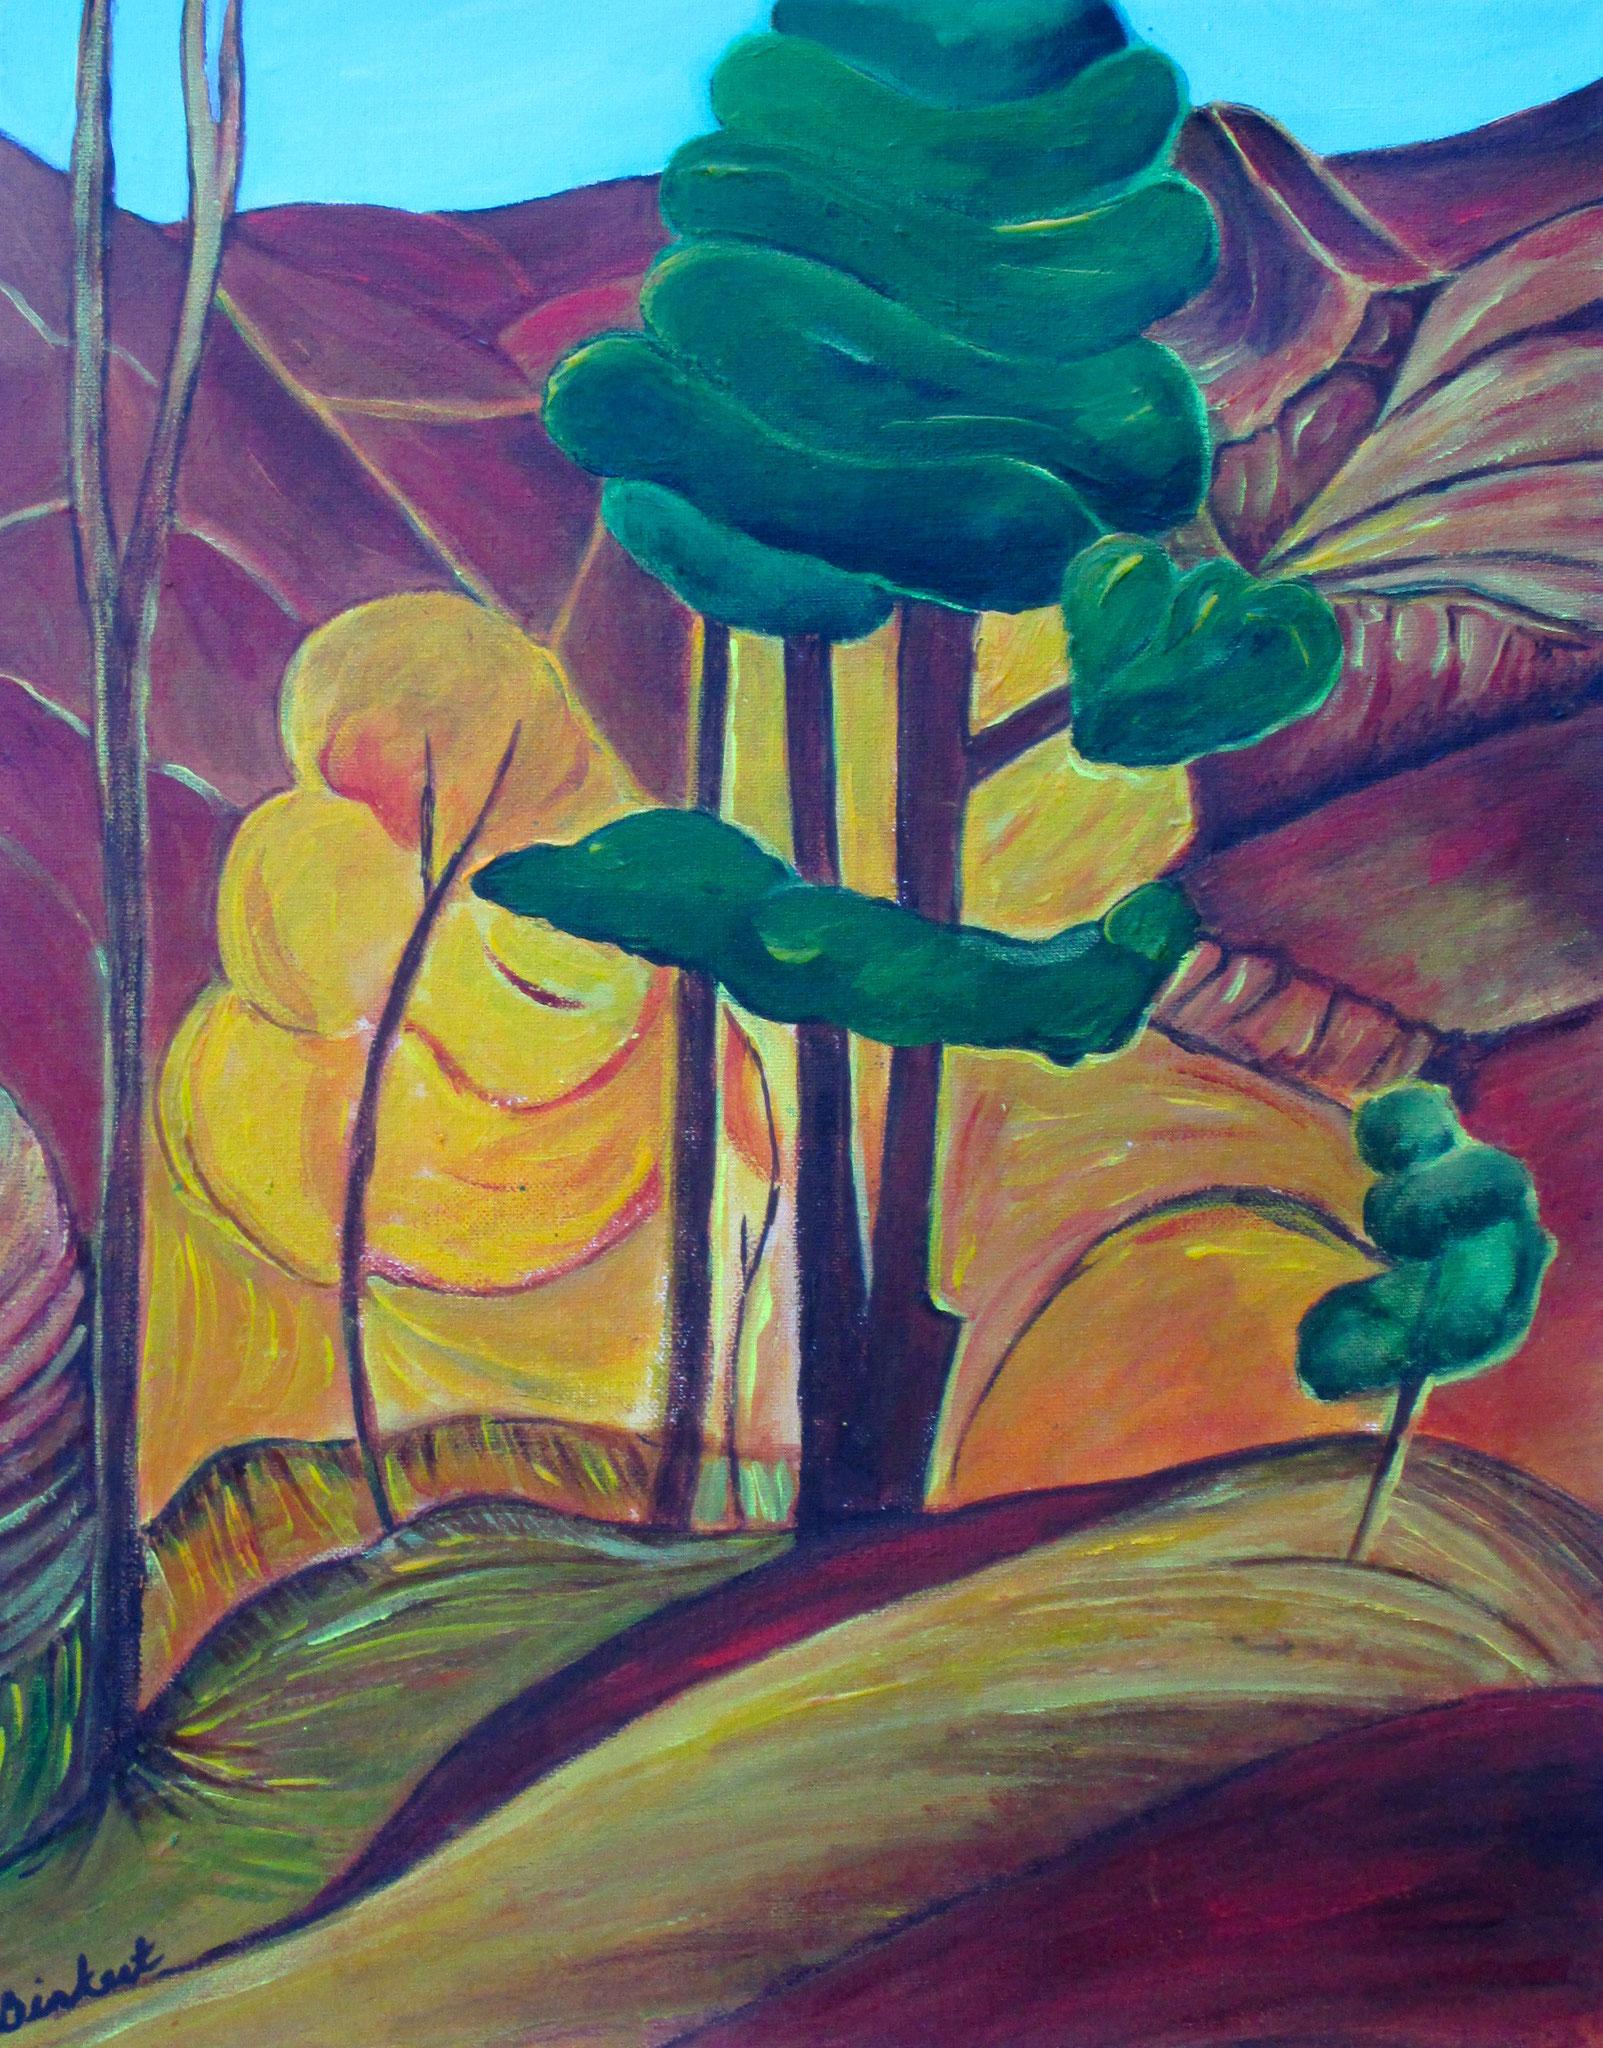 Golden Autumn, acrylic on canvas, 16 x 20, SOLD